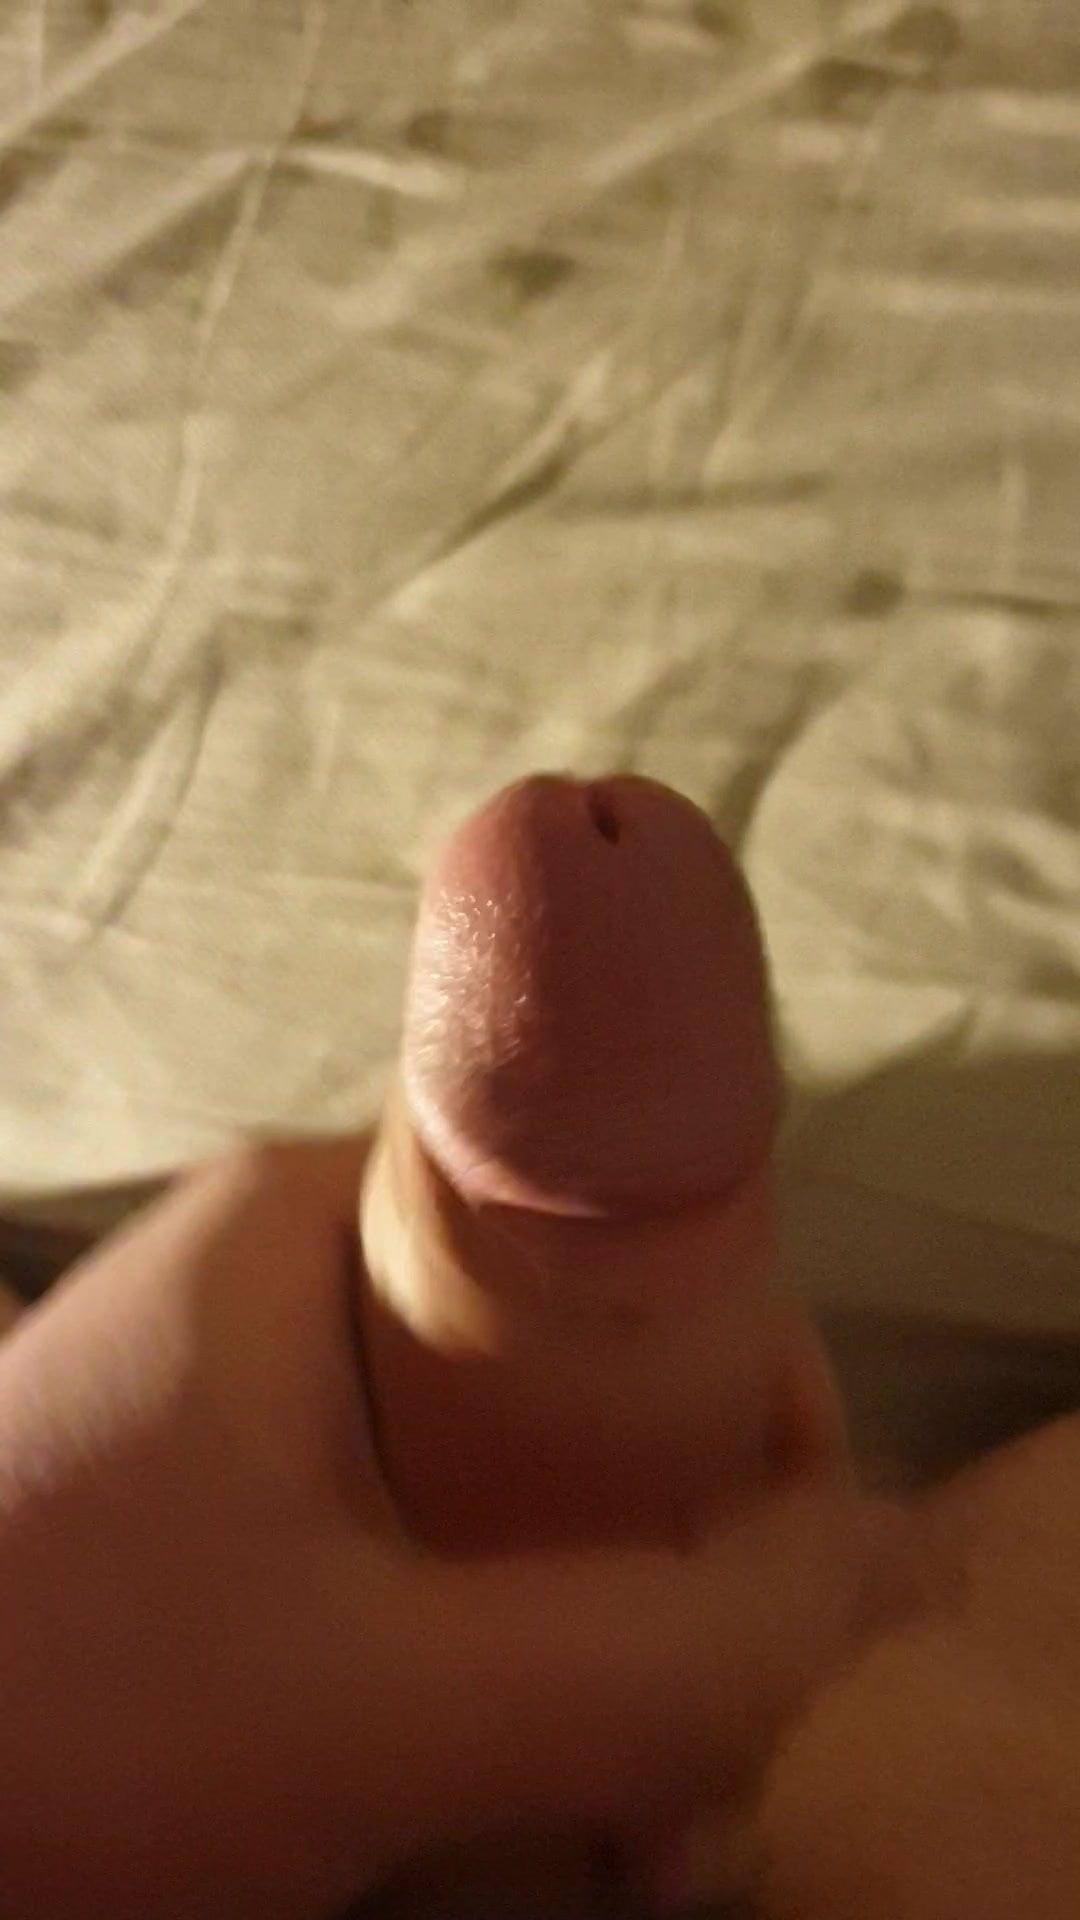 Cumming on my mattress sheets